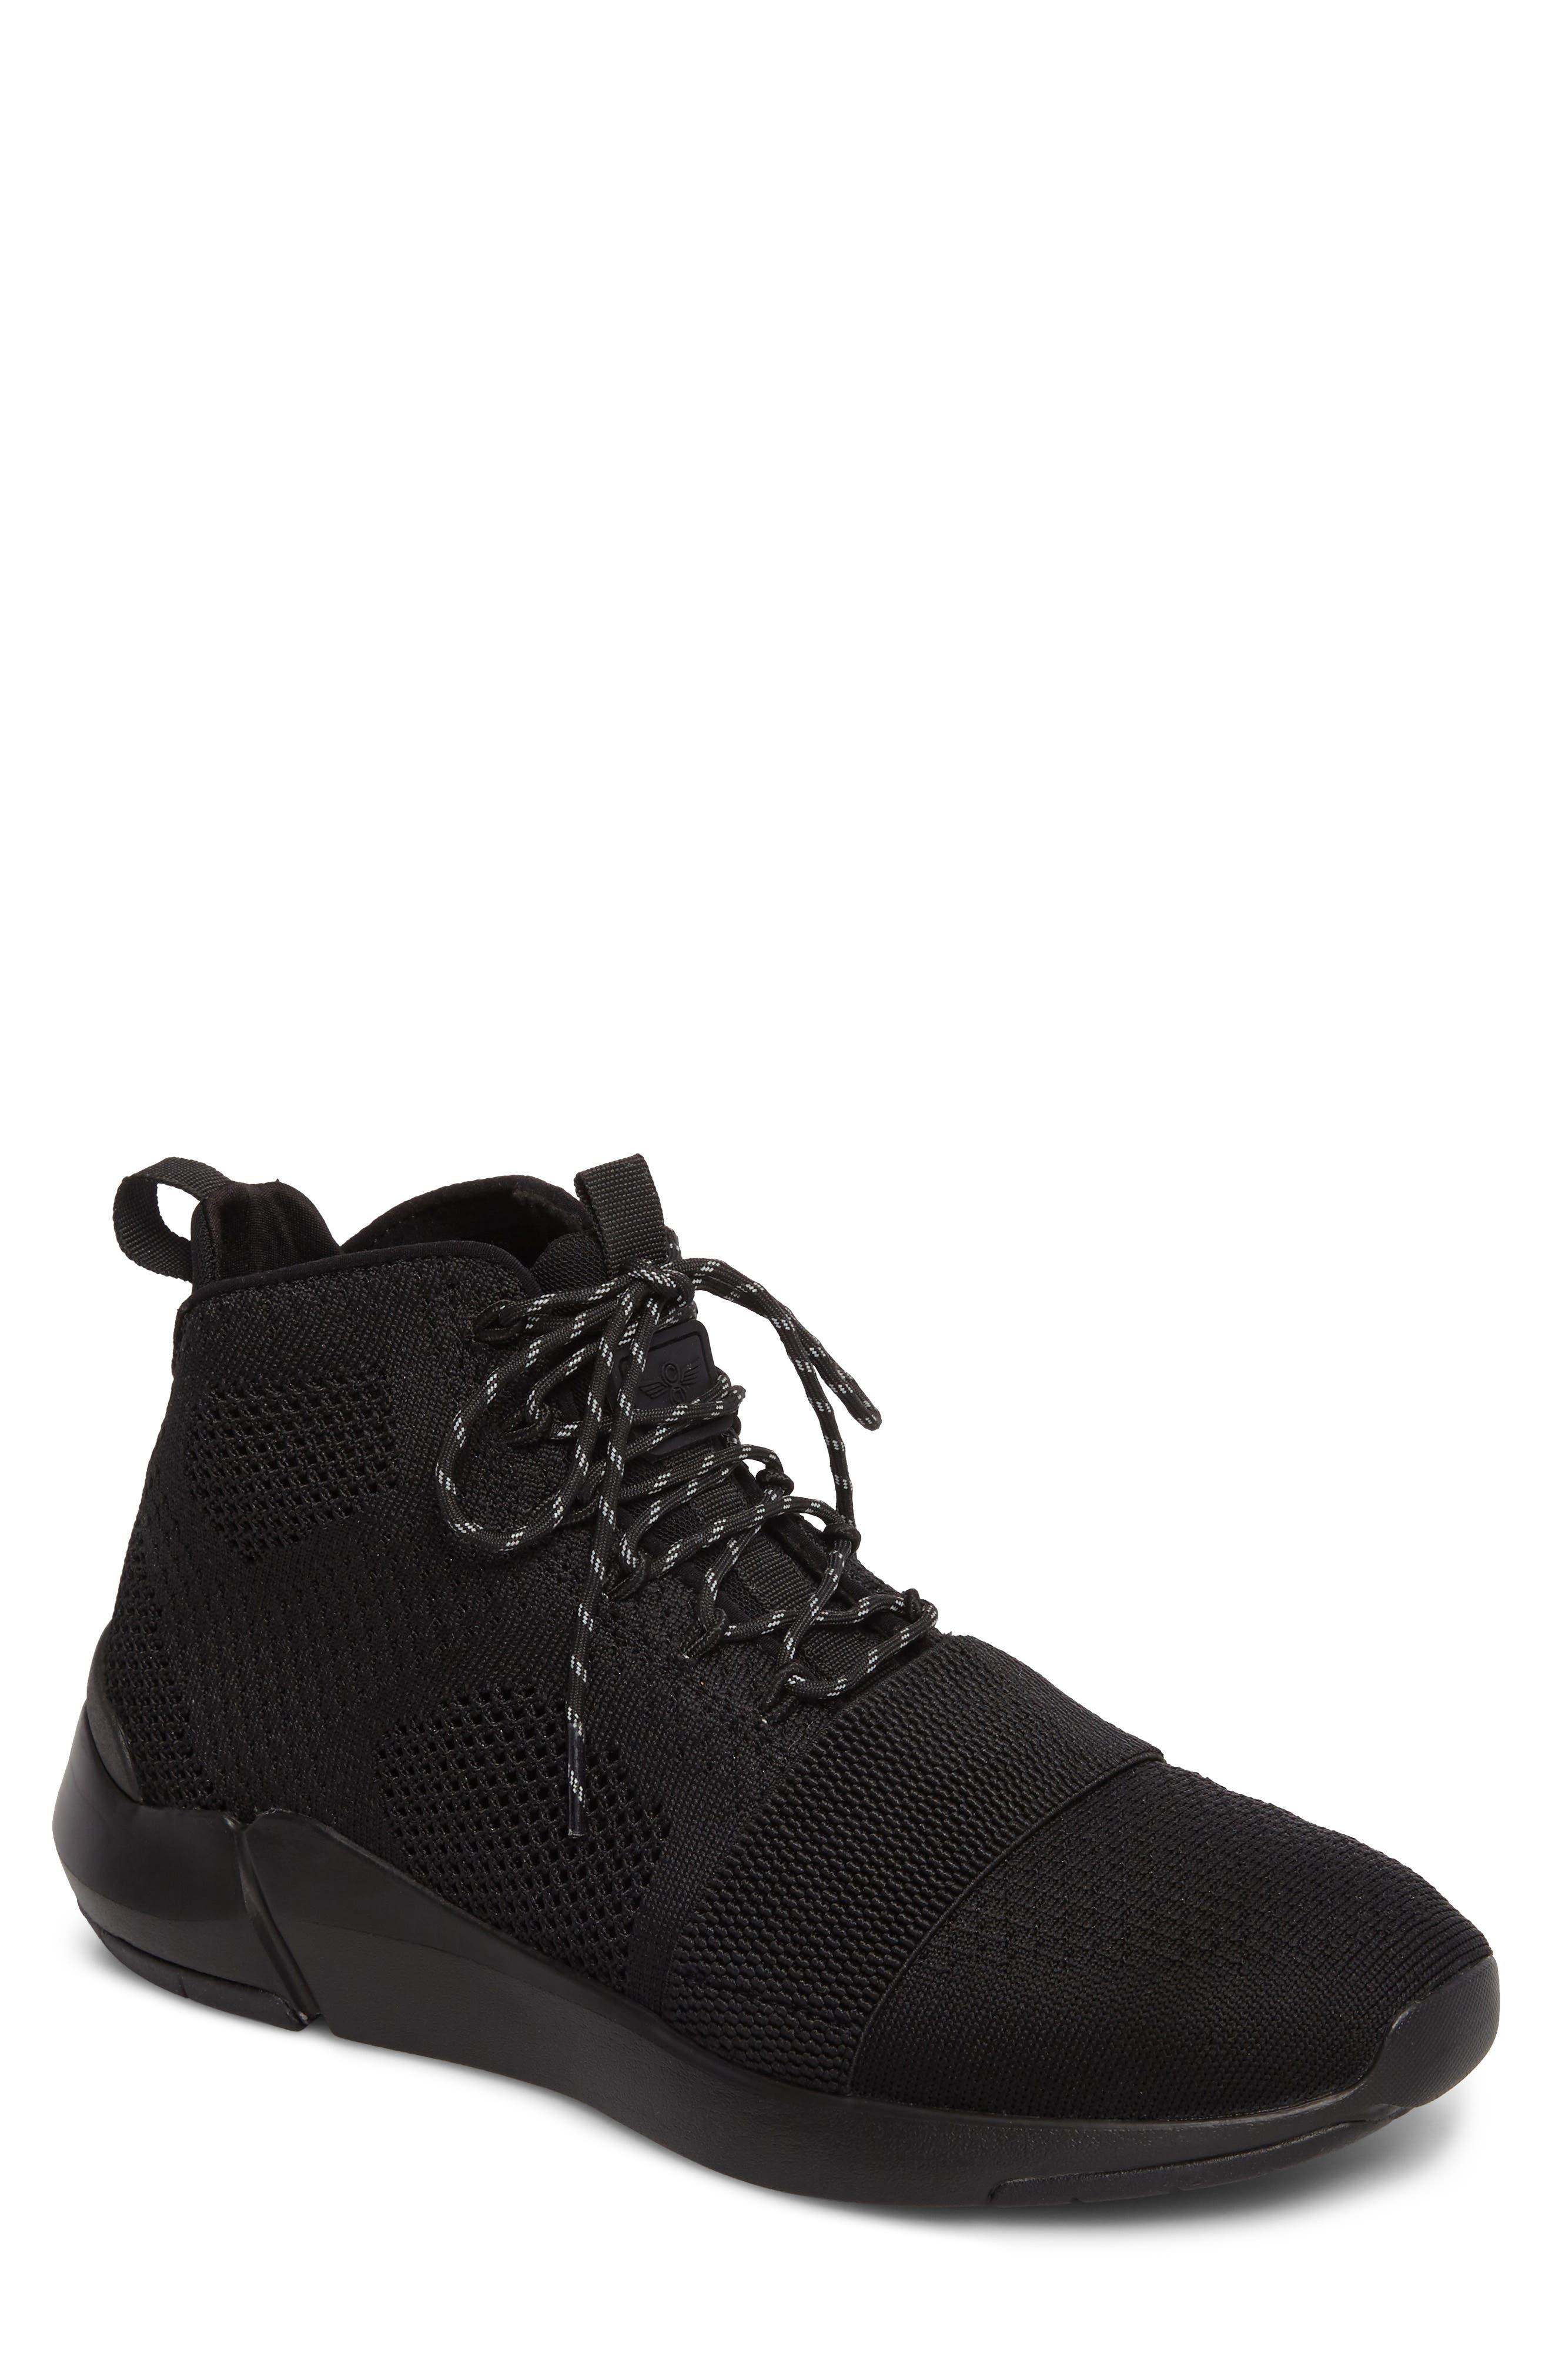 Alternate Image 1 Selected - Creative Recreation Modica Sneaker (Men)